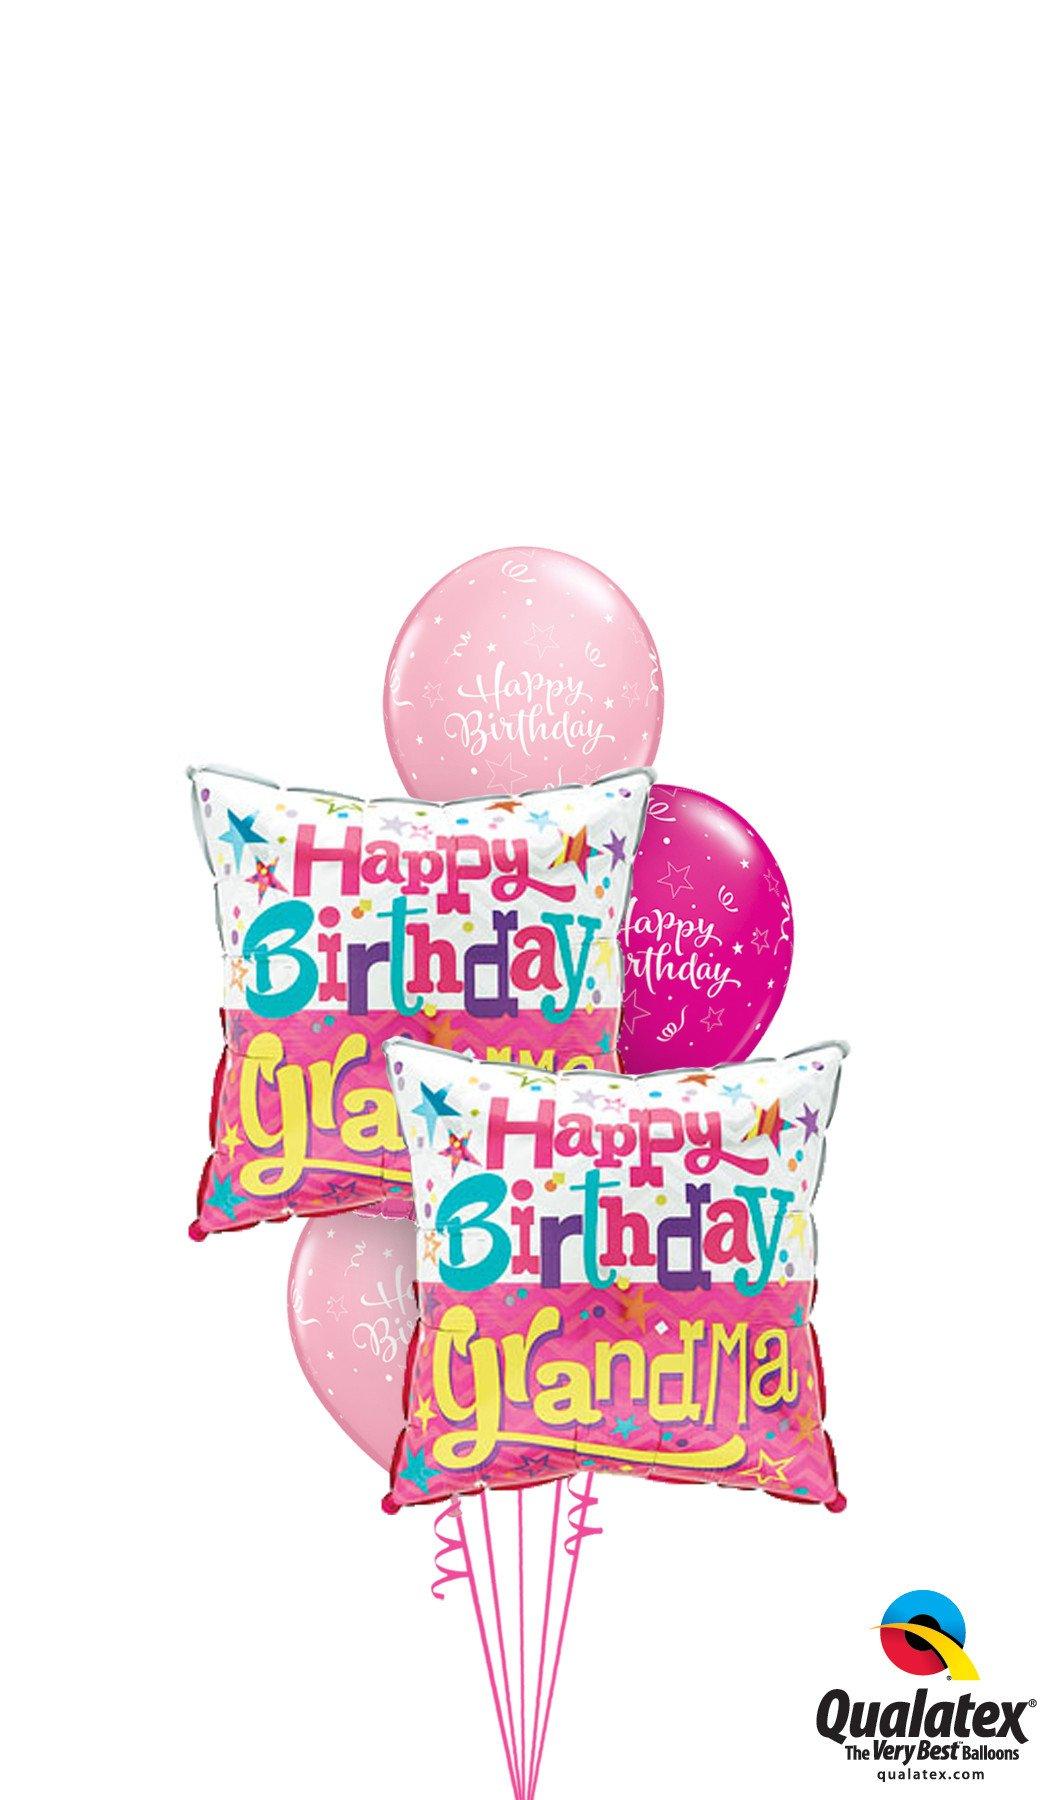 Happy Birthday Grandma.